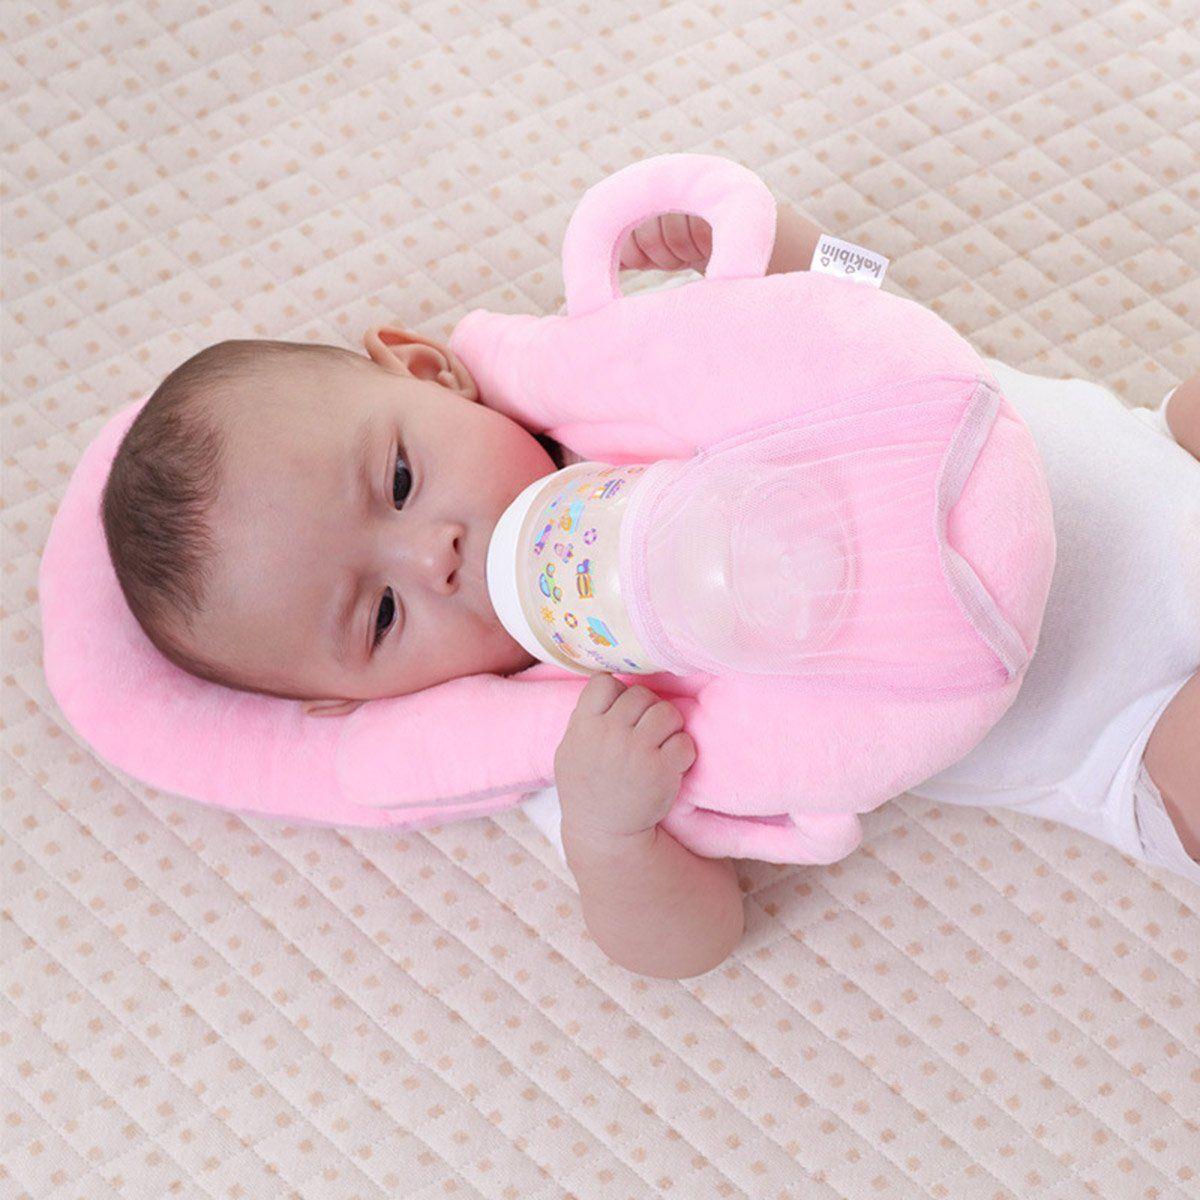 Activity & Gear Multi-layer Breastfeeding Pillow Multifunctional Breast Pillows